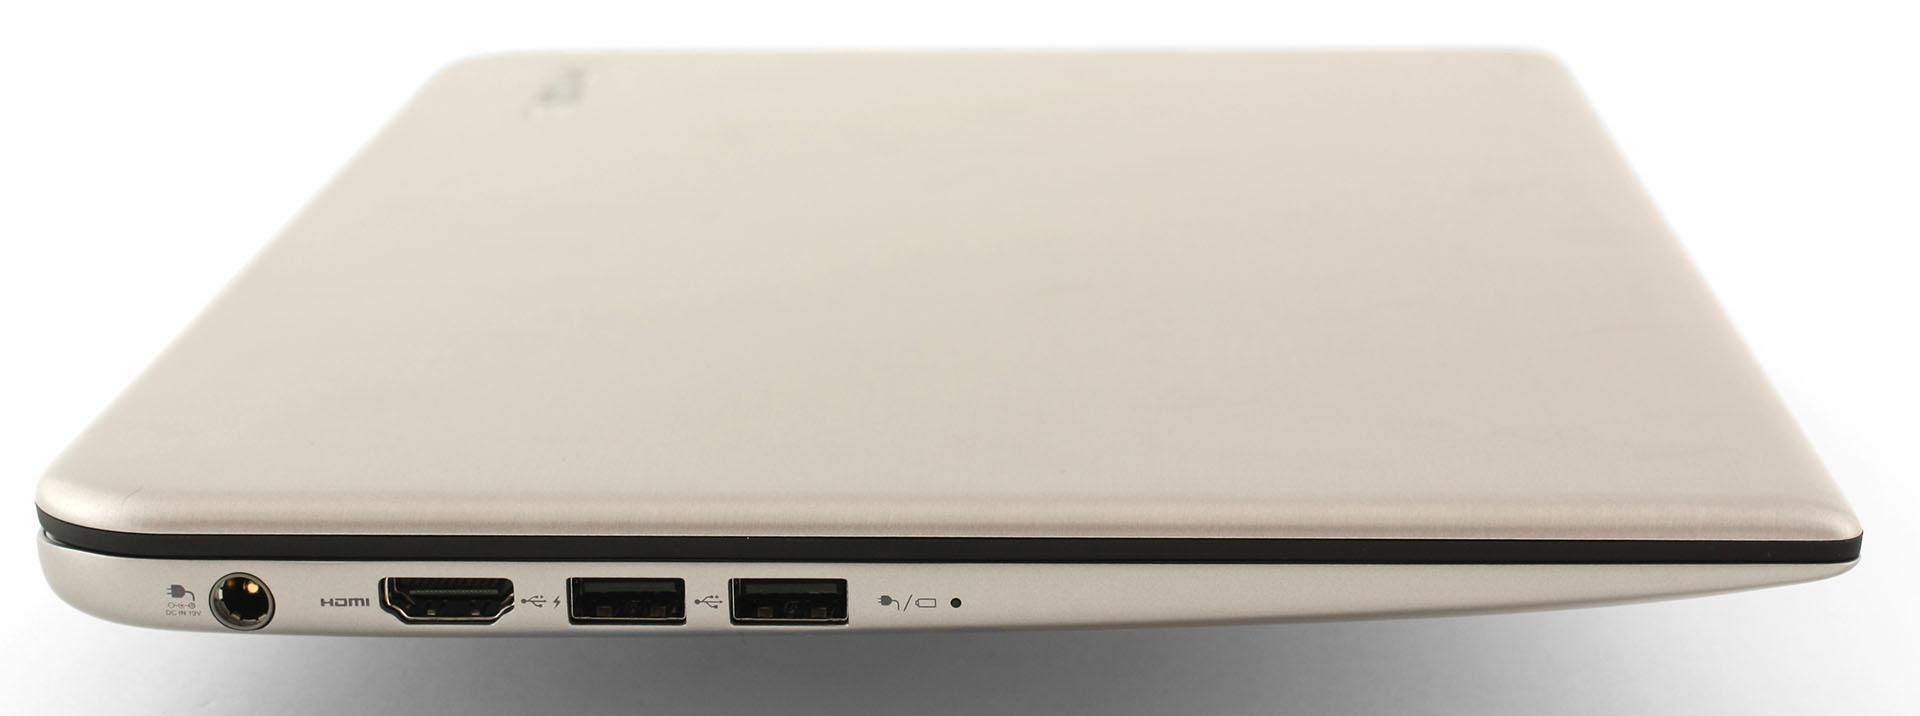 Toshiba KIRA (KIRAbook) review – what makes Toshiba's best ...